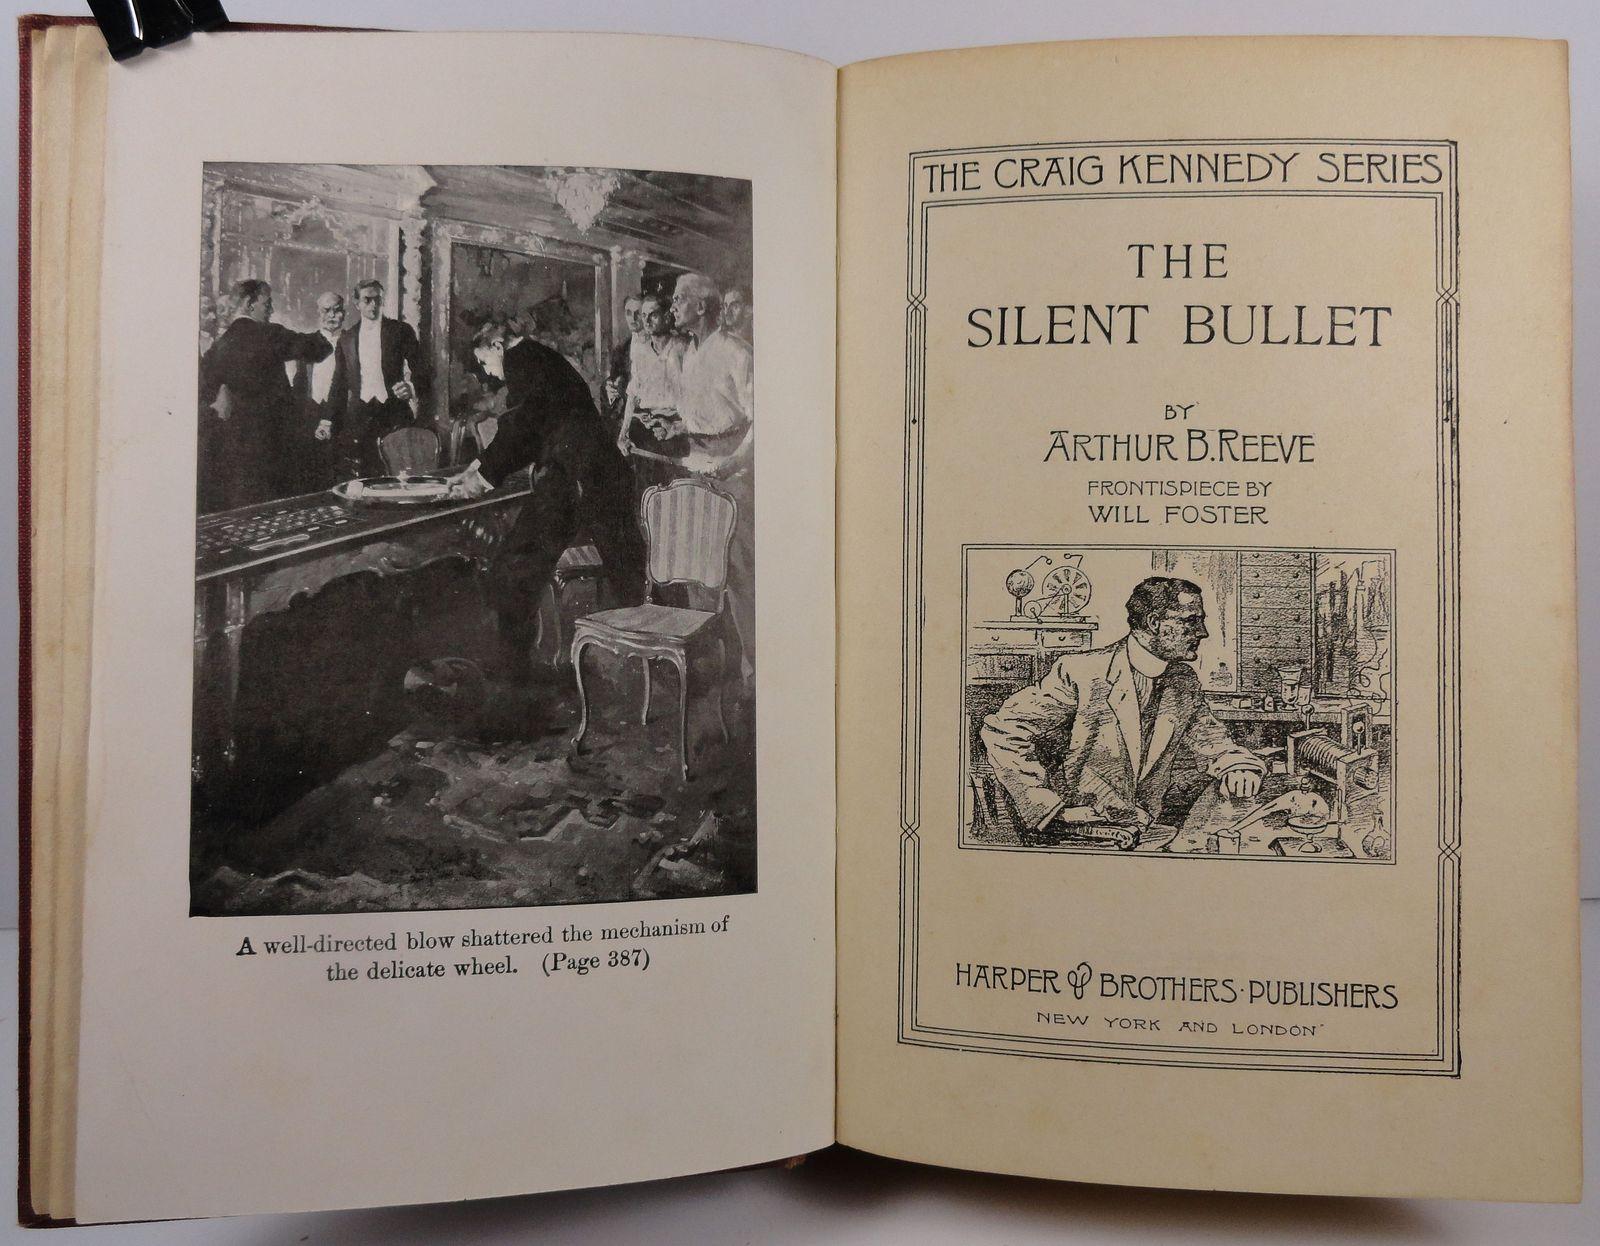 The Silent Bullet by Arthur B Reeve The Craig Kennedy Series